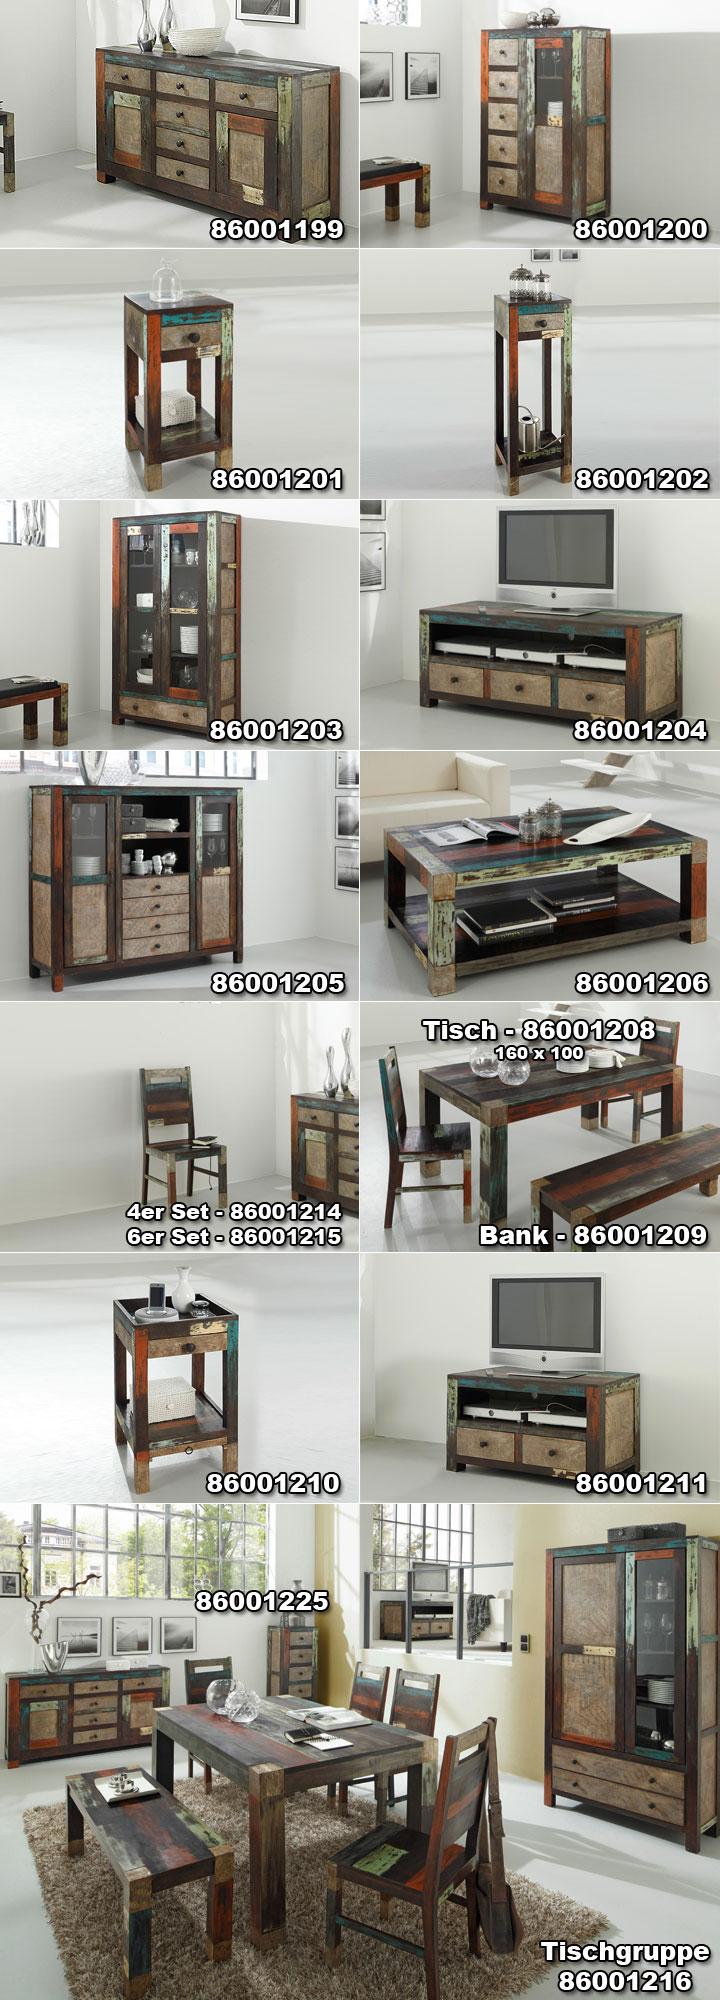 esstisch daro tisch in mango massiv vintage used look. Black Bedroom Furniture Sets. Home Design Ideas